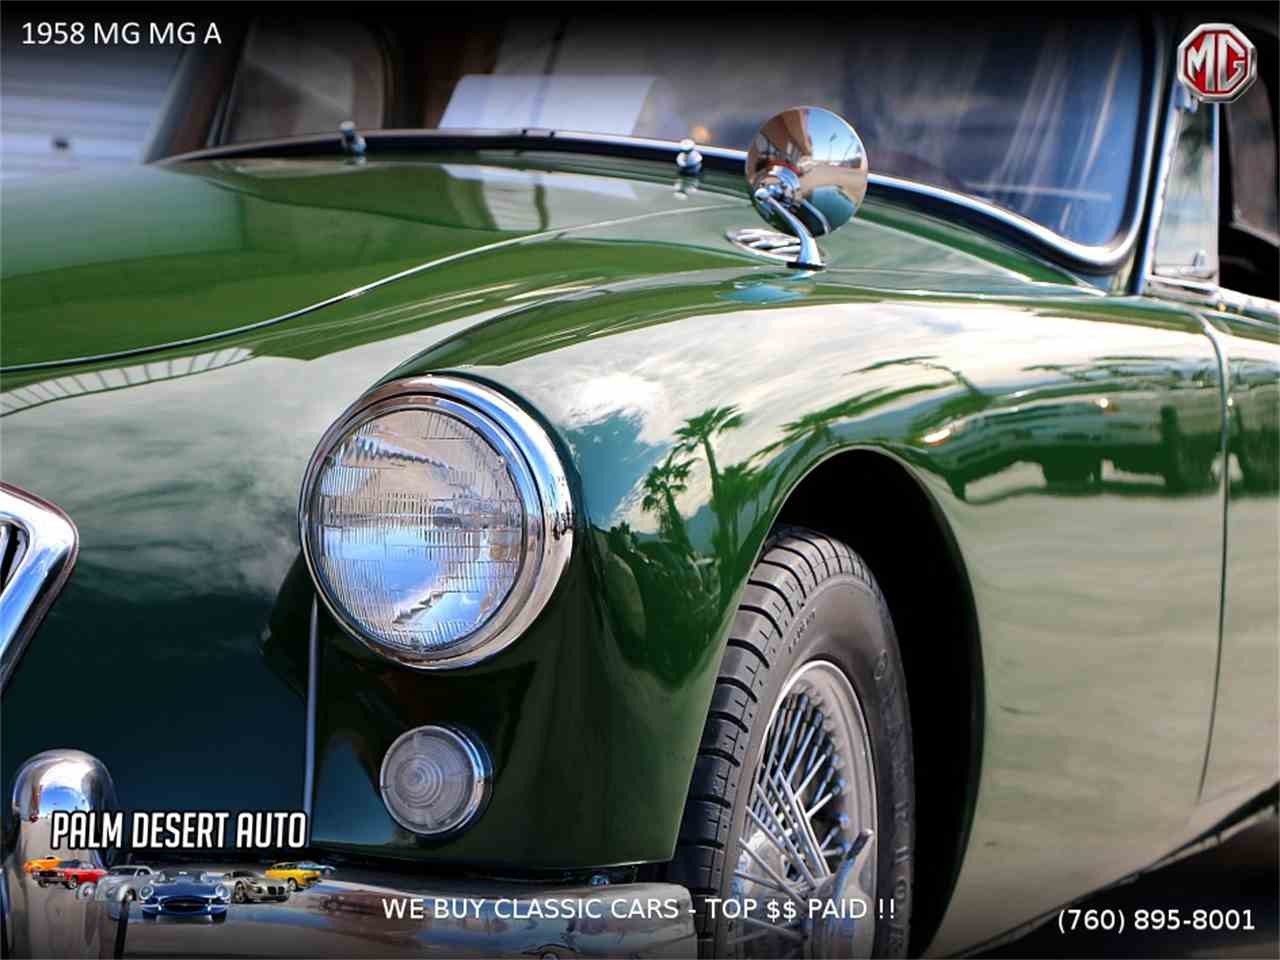 1958 MG MGA for Sale | ClassicCars.com | CC-1058212